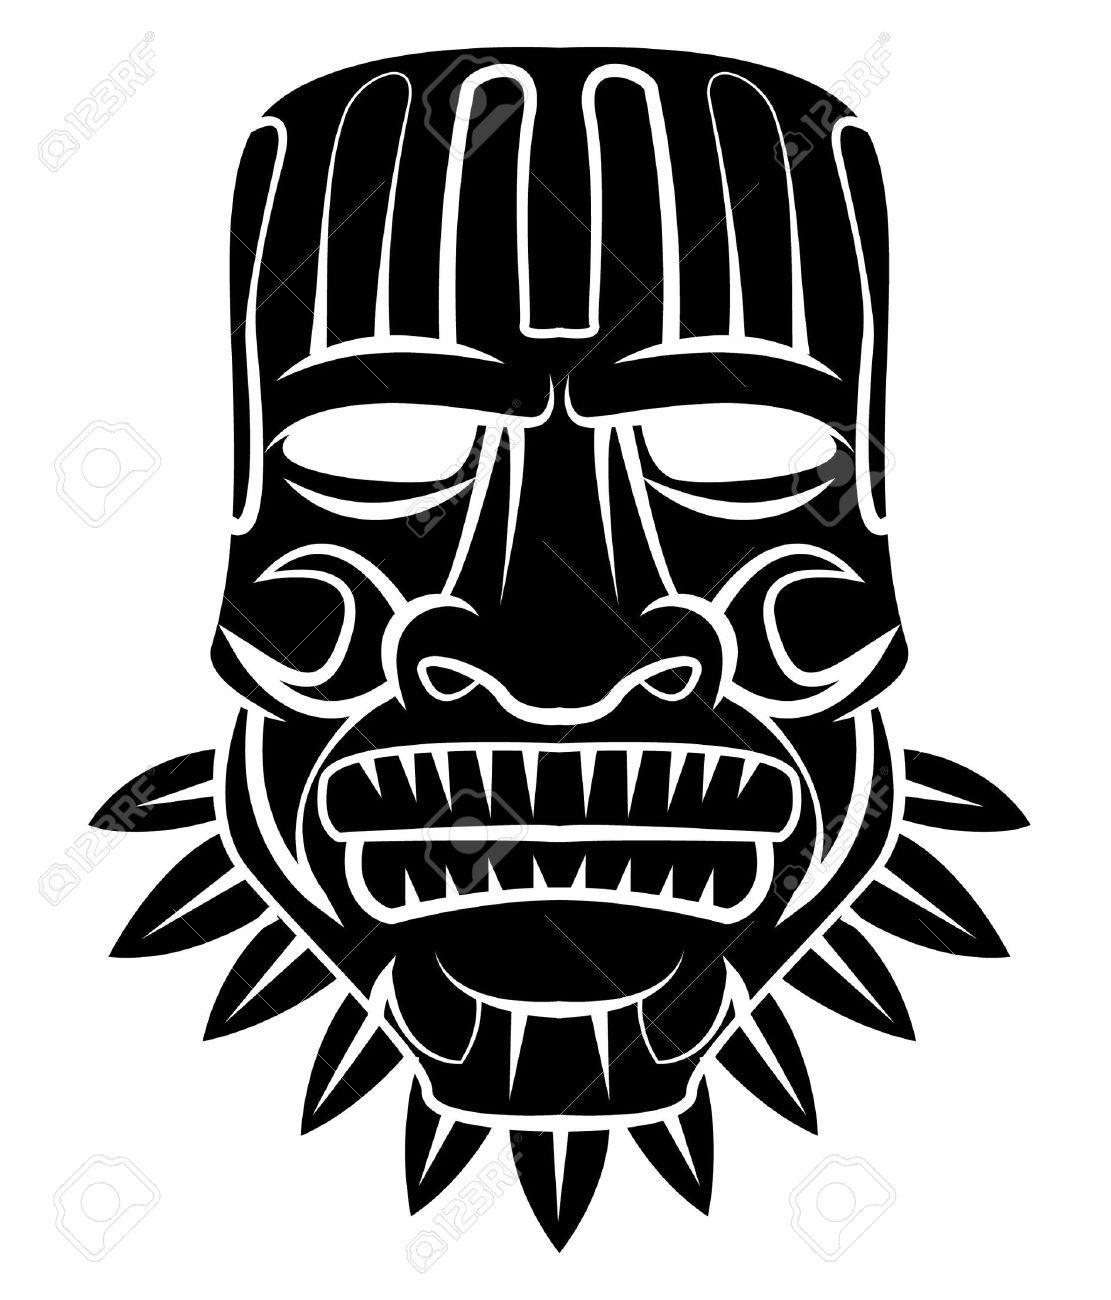 Totem Mask Black Silhoutte Of - 35688439